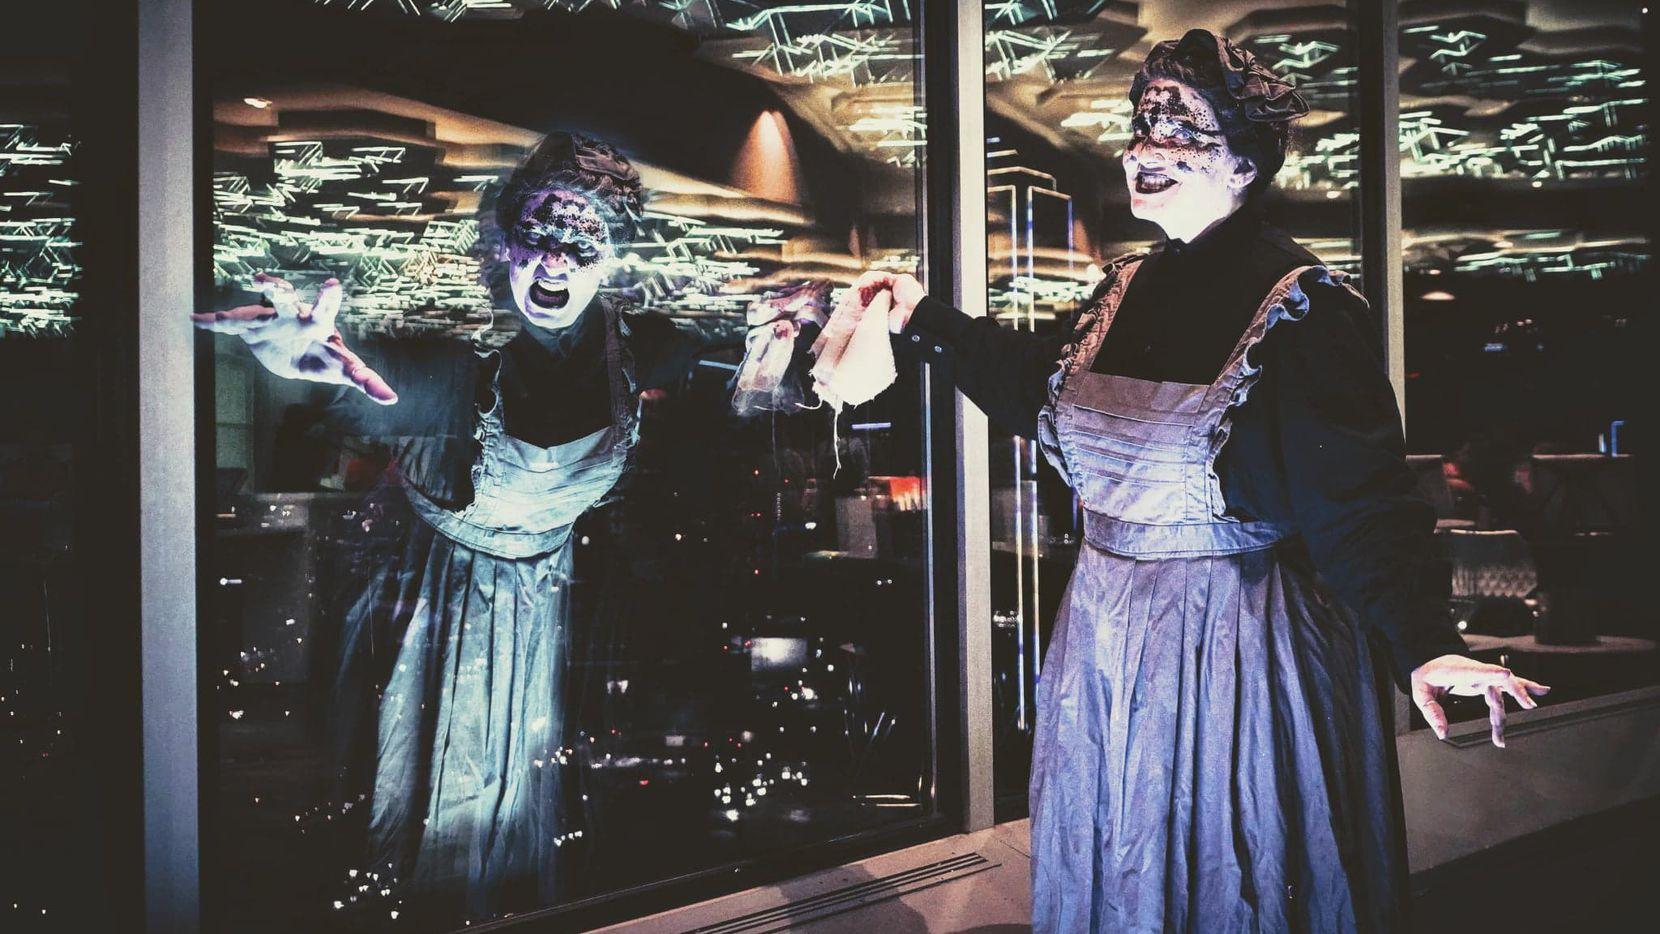 Halloween Fairs In Garland Area 2020 Halloween fun is brewing across D FW